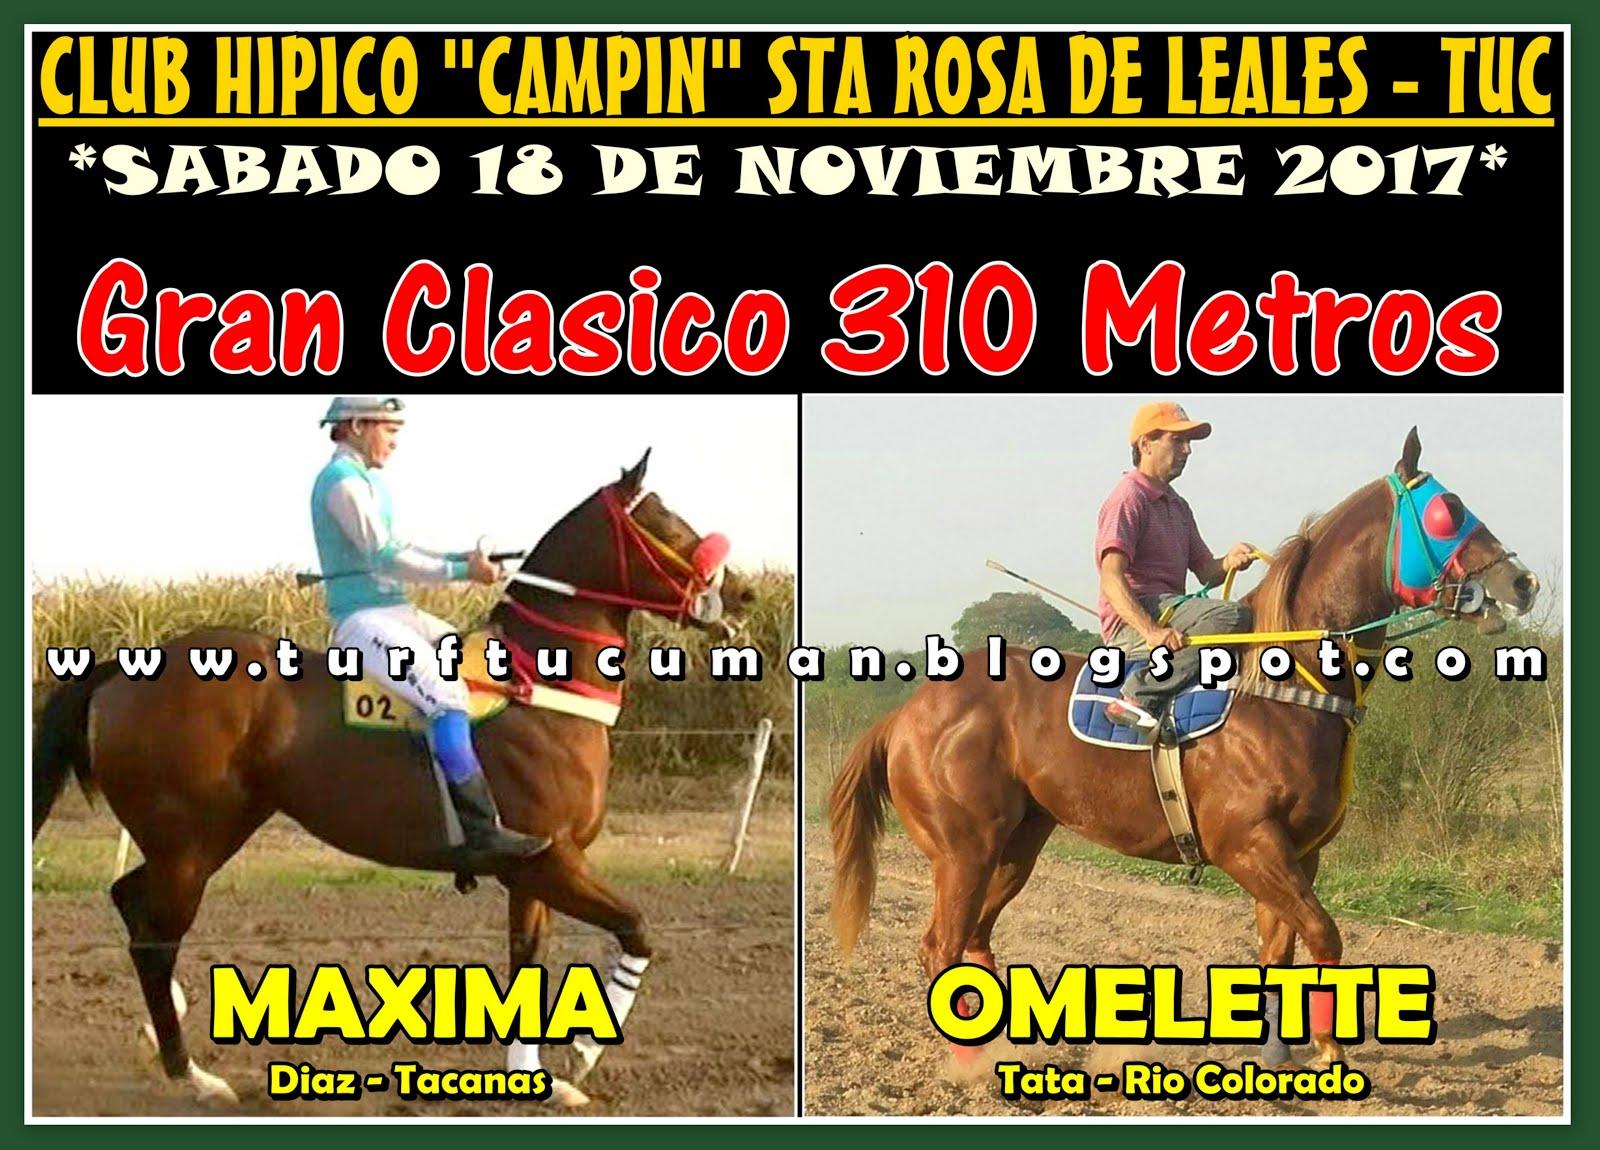 MAXIMA VS OMELETTE